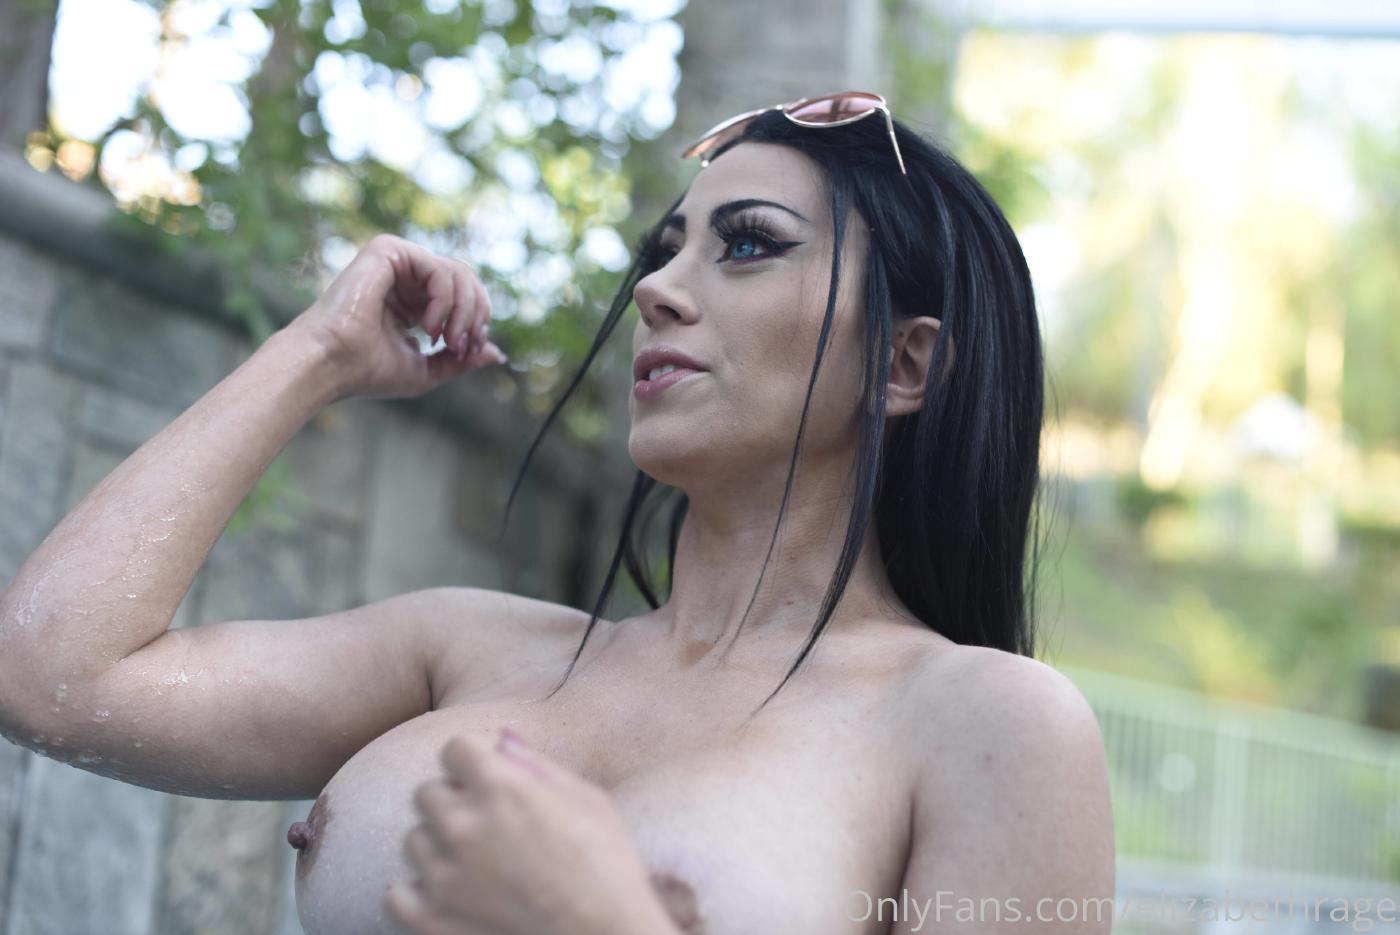 Elizabeth Rage Nude Outdoor Pool Onlyfans Set Leaked 0017